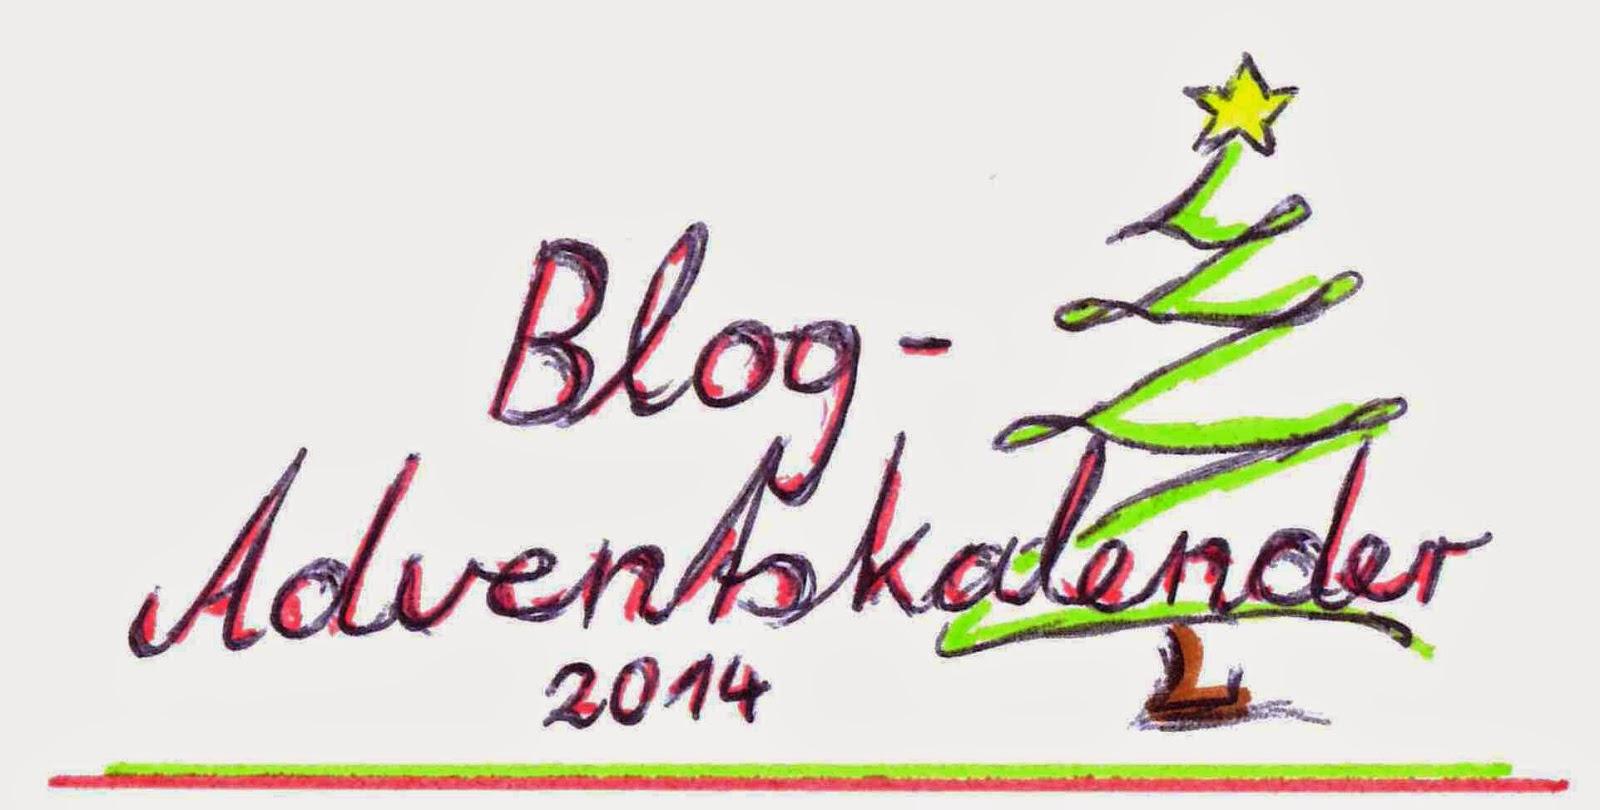 http://annies-diy.blogspot.de/p/adventskalender.html